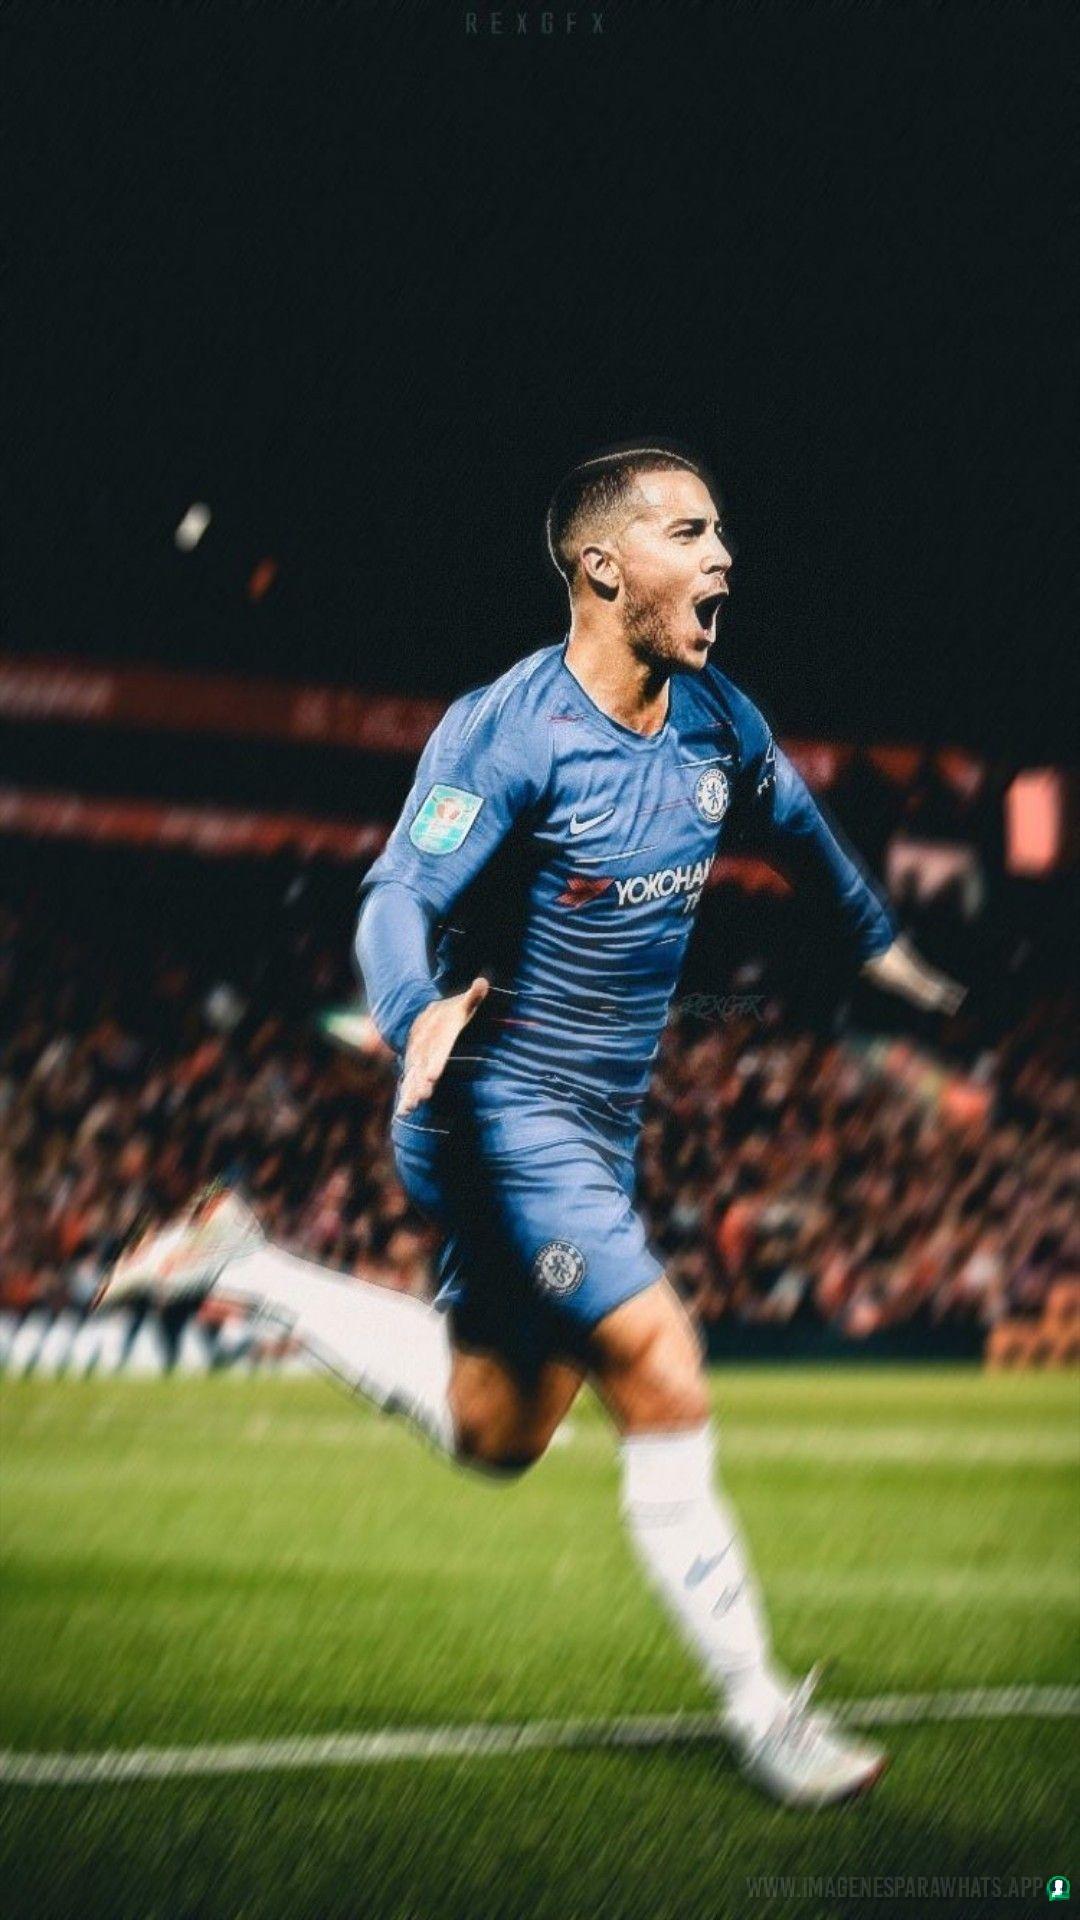 Imagenes de Futbol (1200)